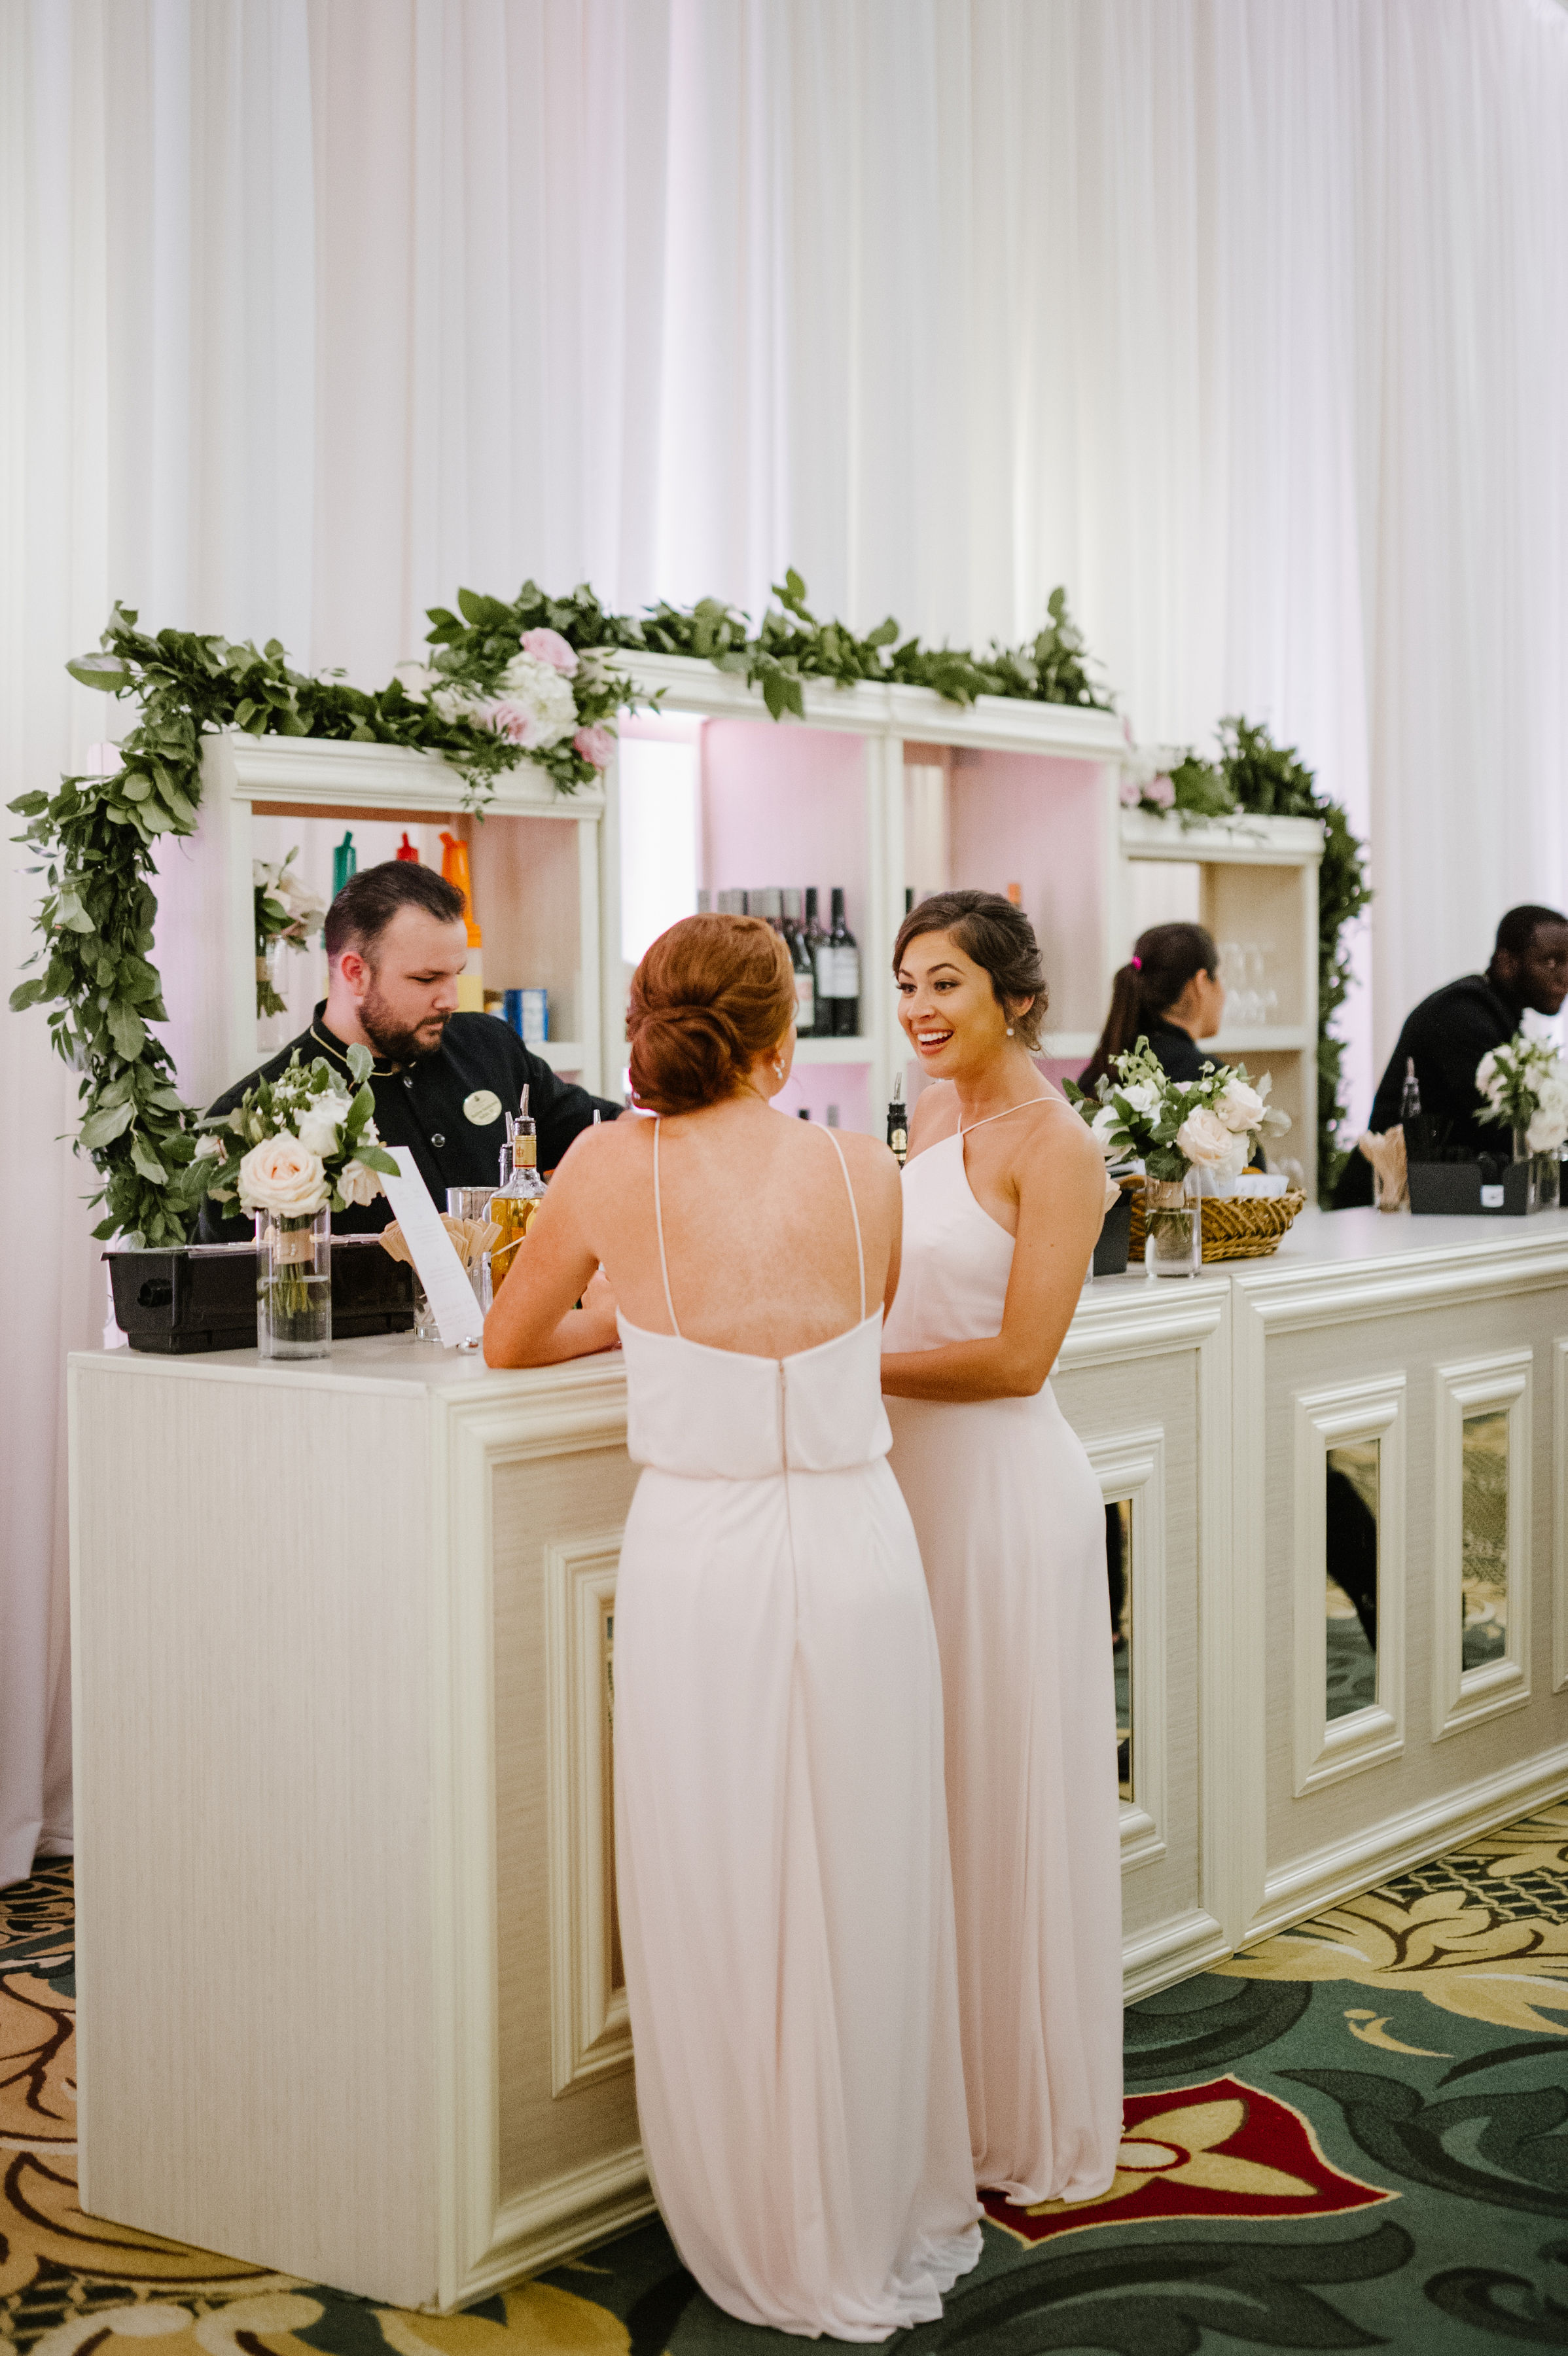 McElravey_Wedding_CarolineLimaPhotography_2018_365.jpg